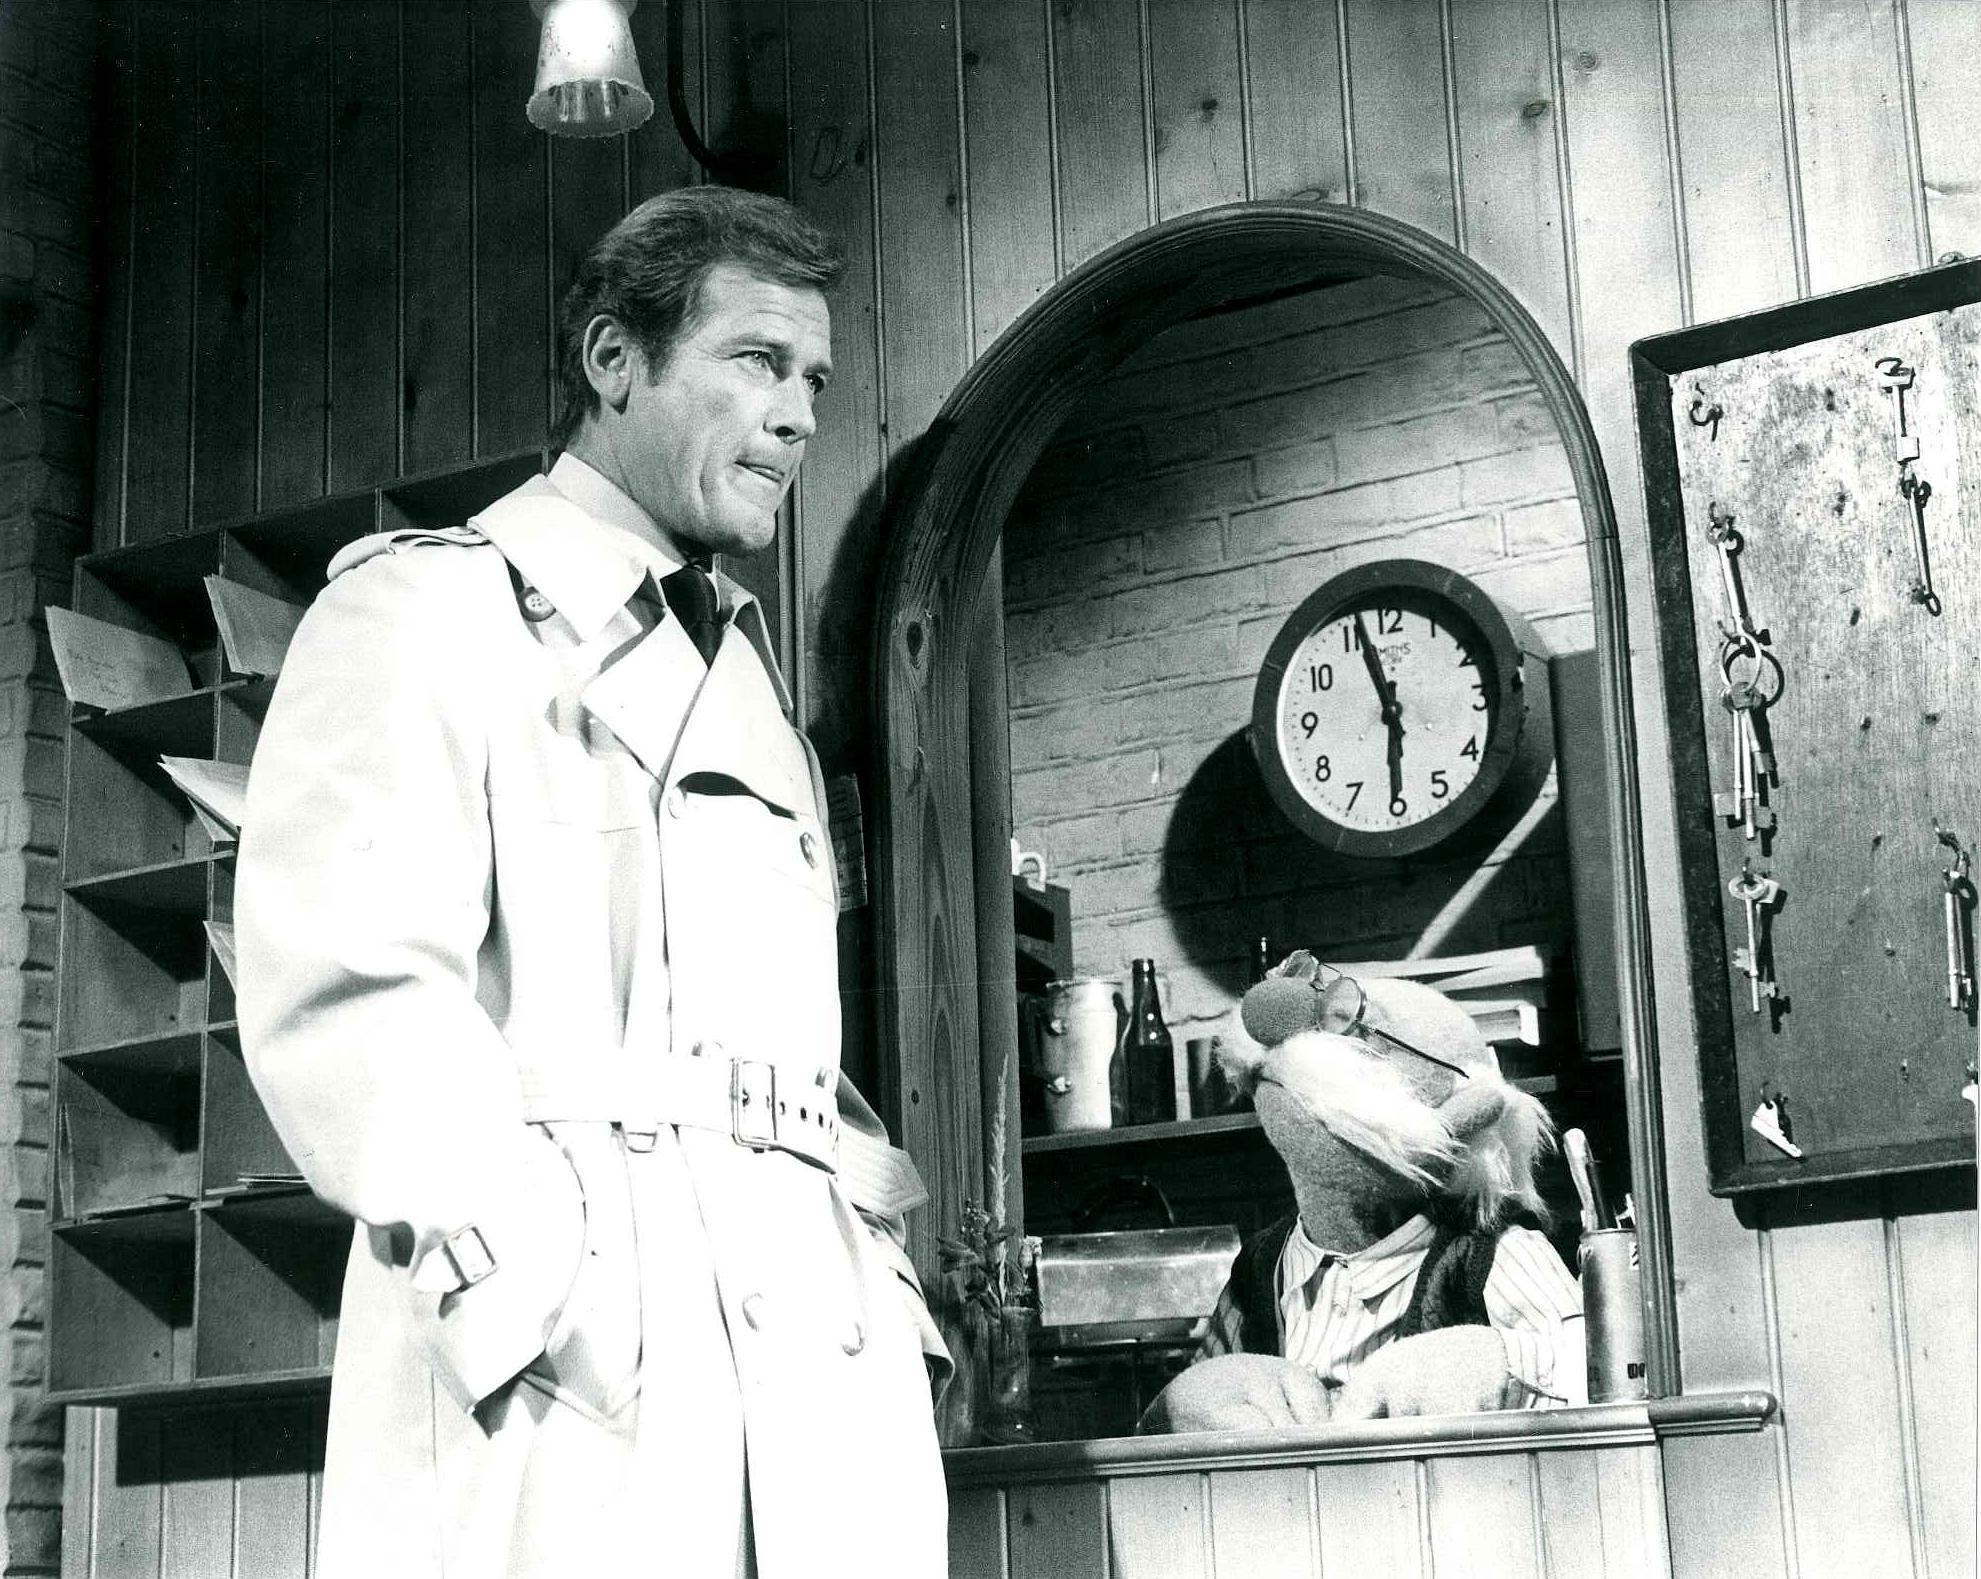 Episode 524: Roger Moore